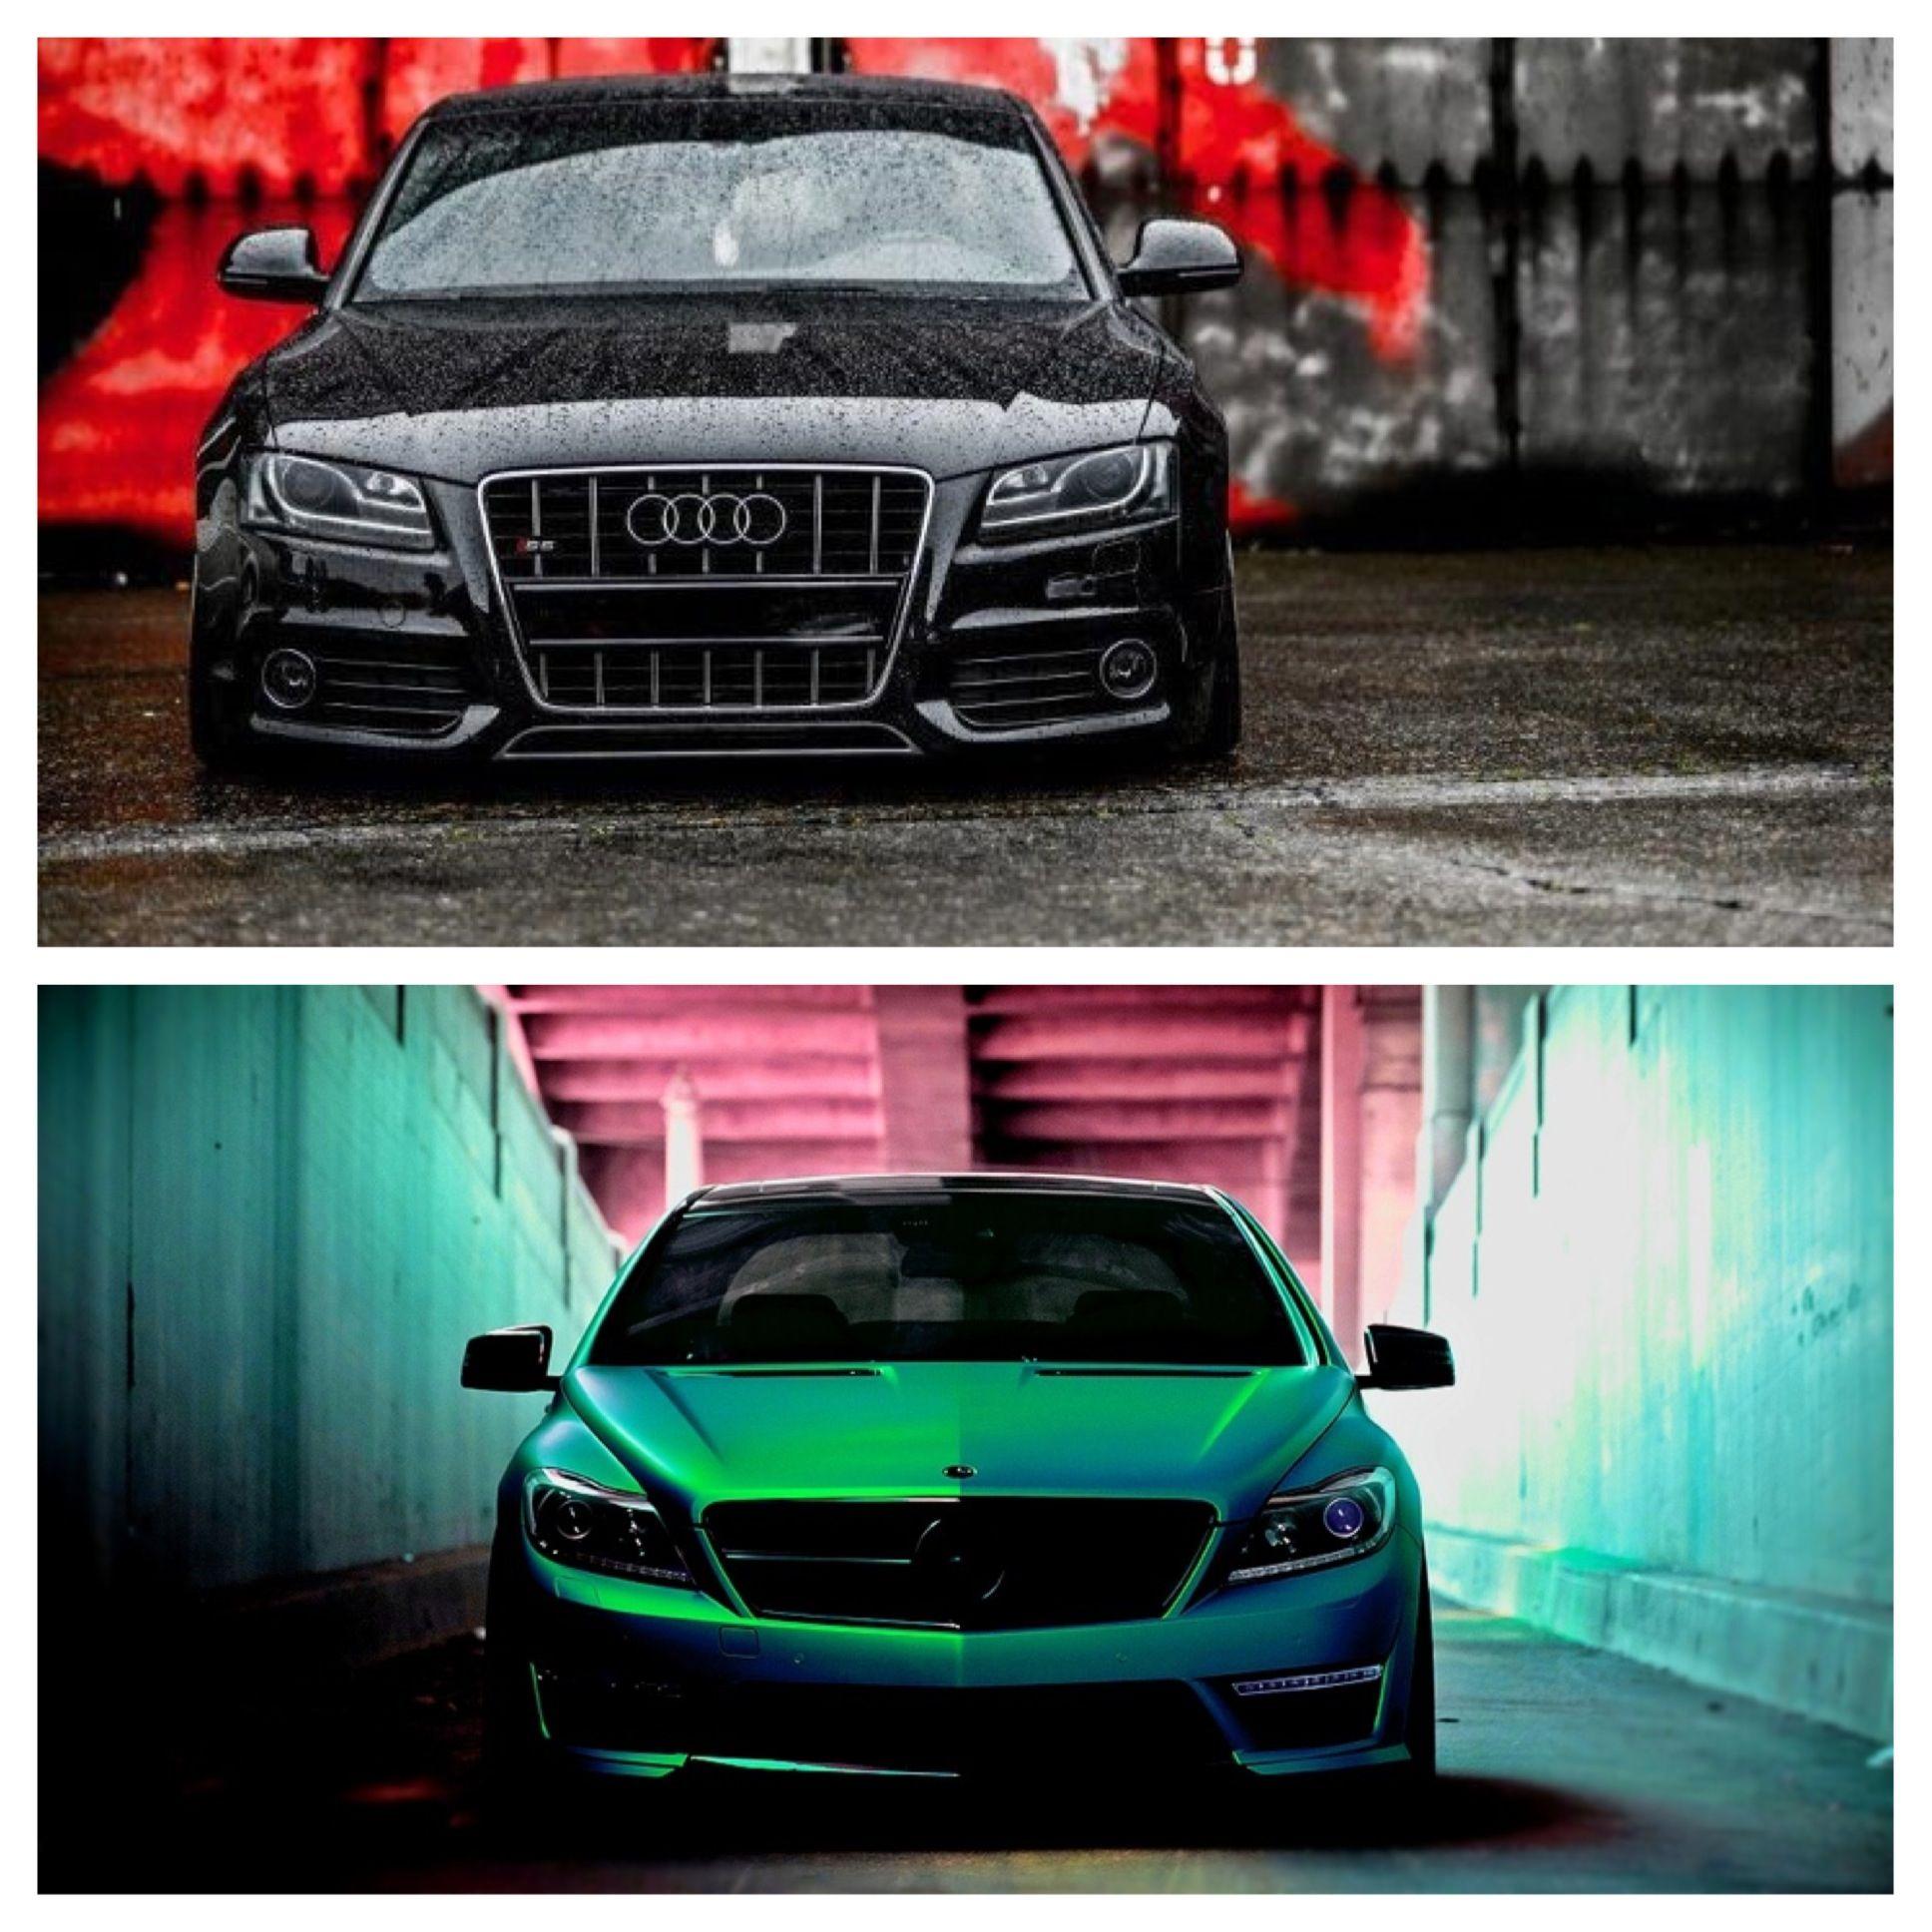 Audi/benz